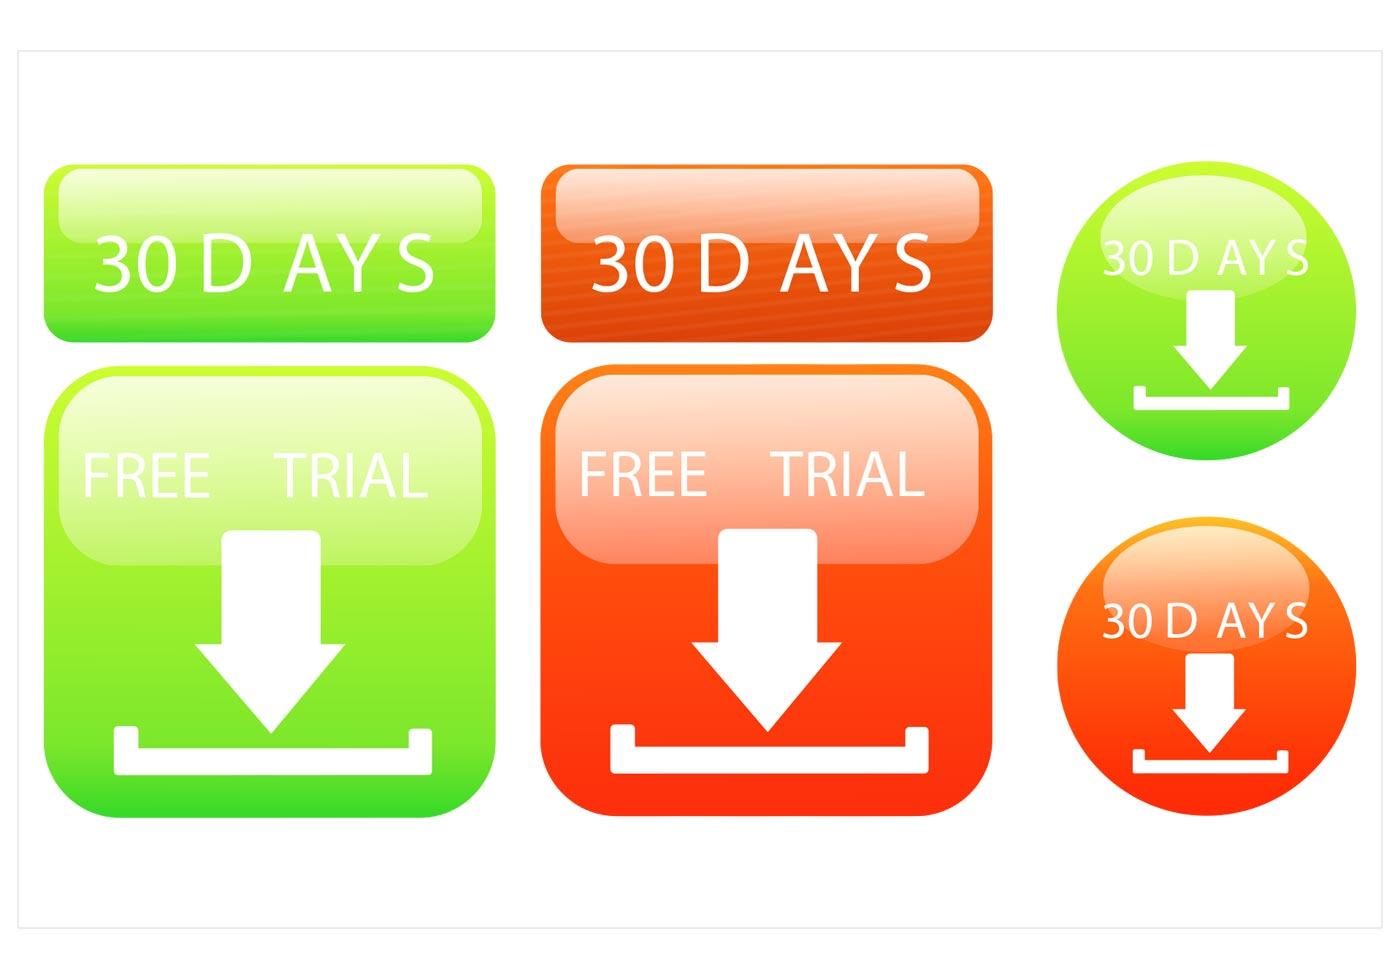 Viagra free 30 day trial